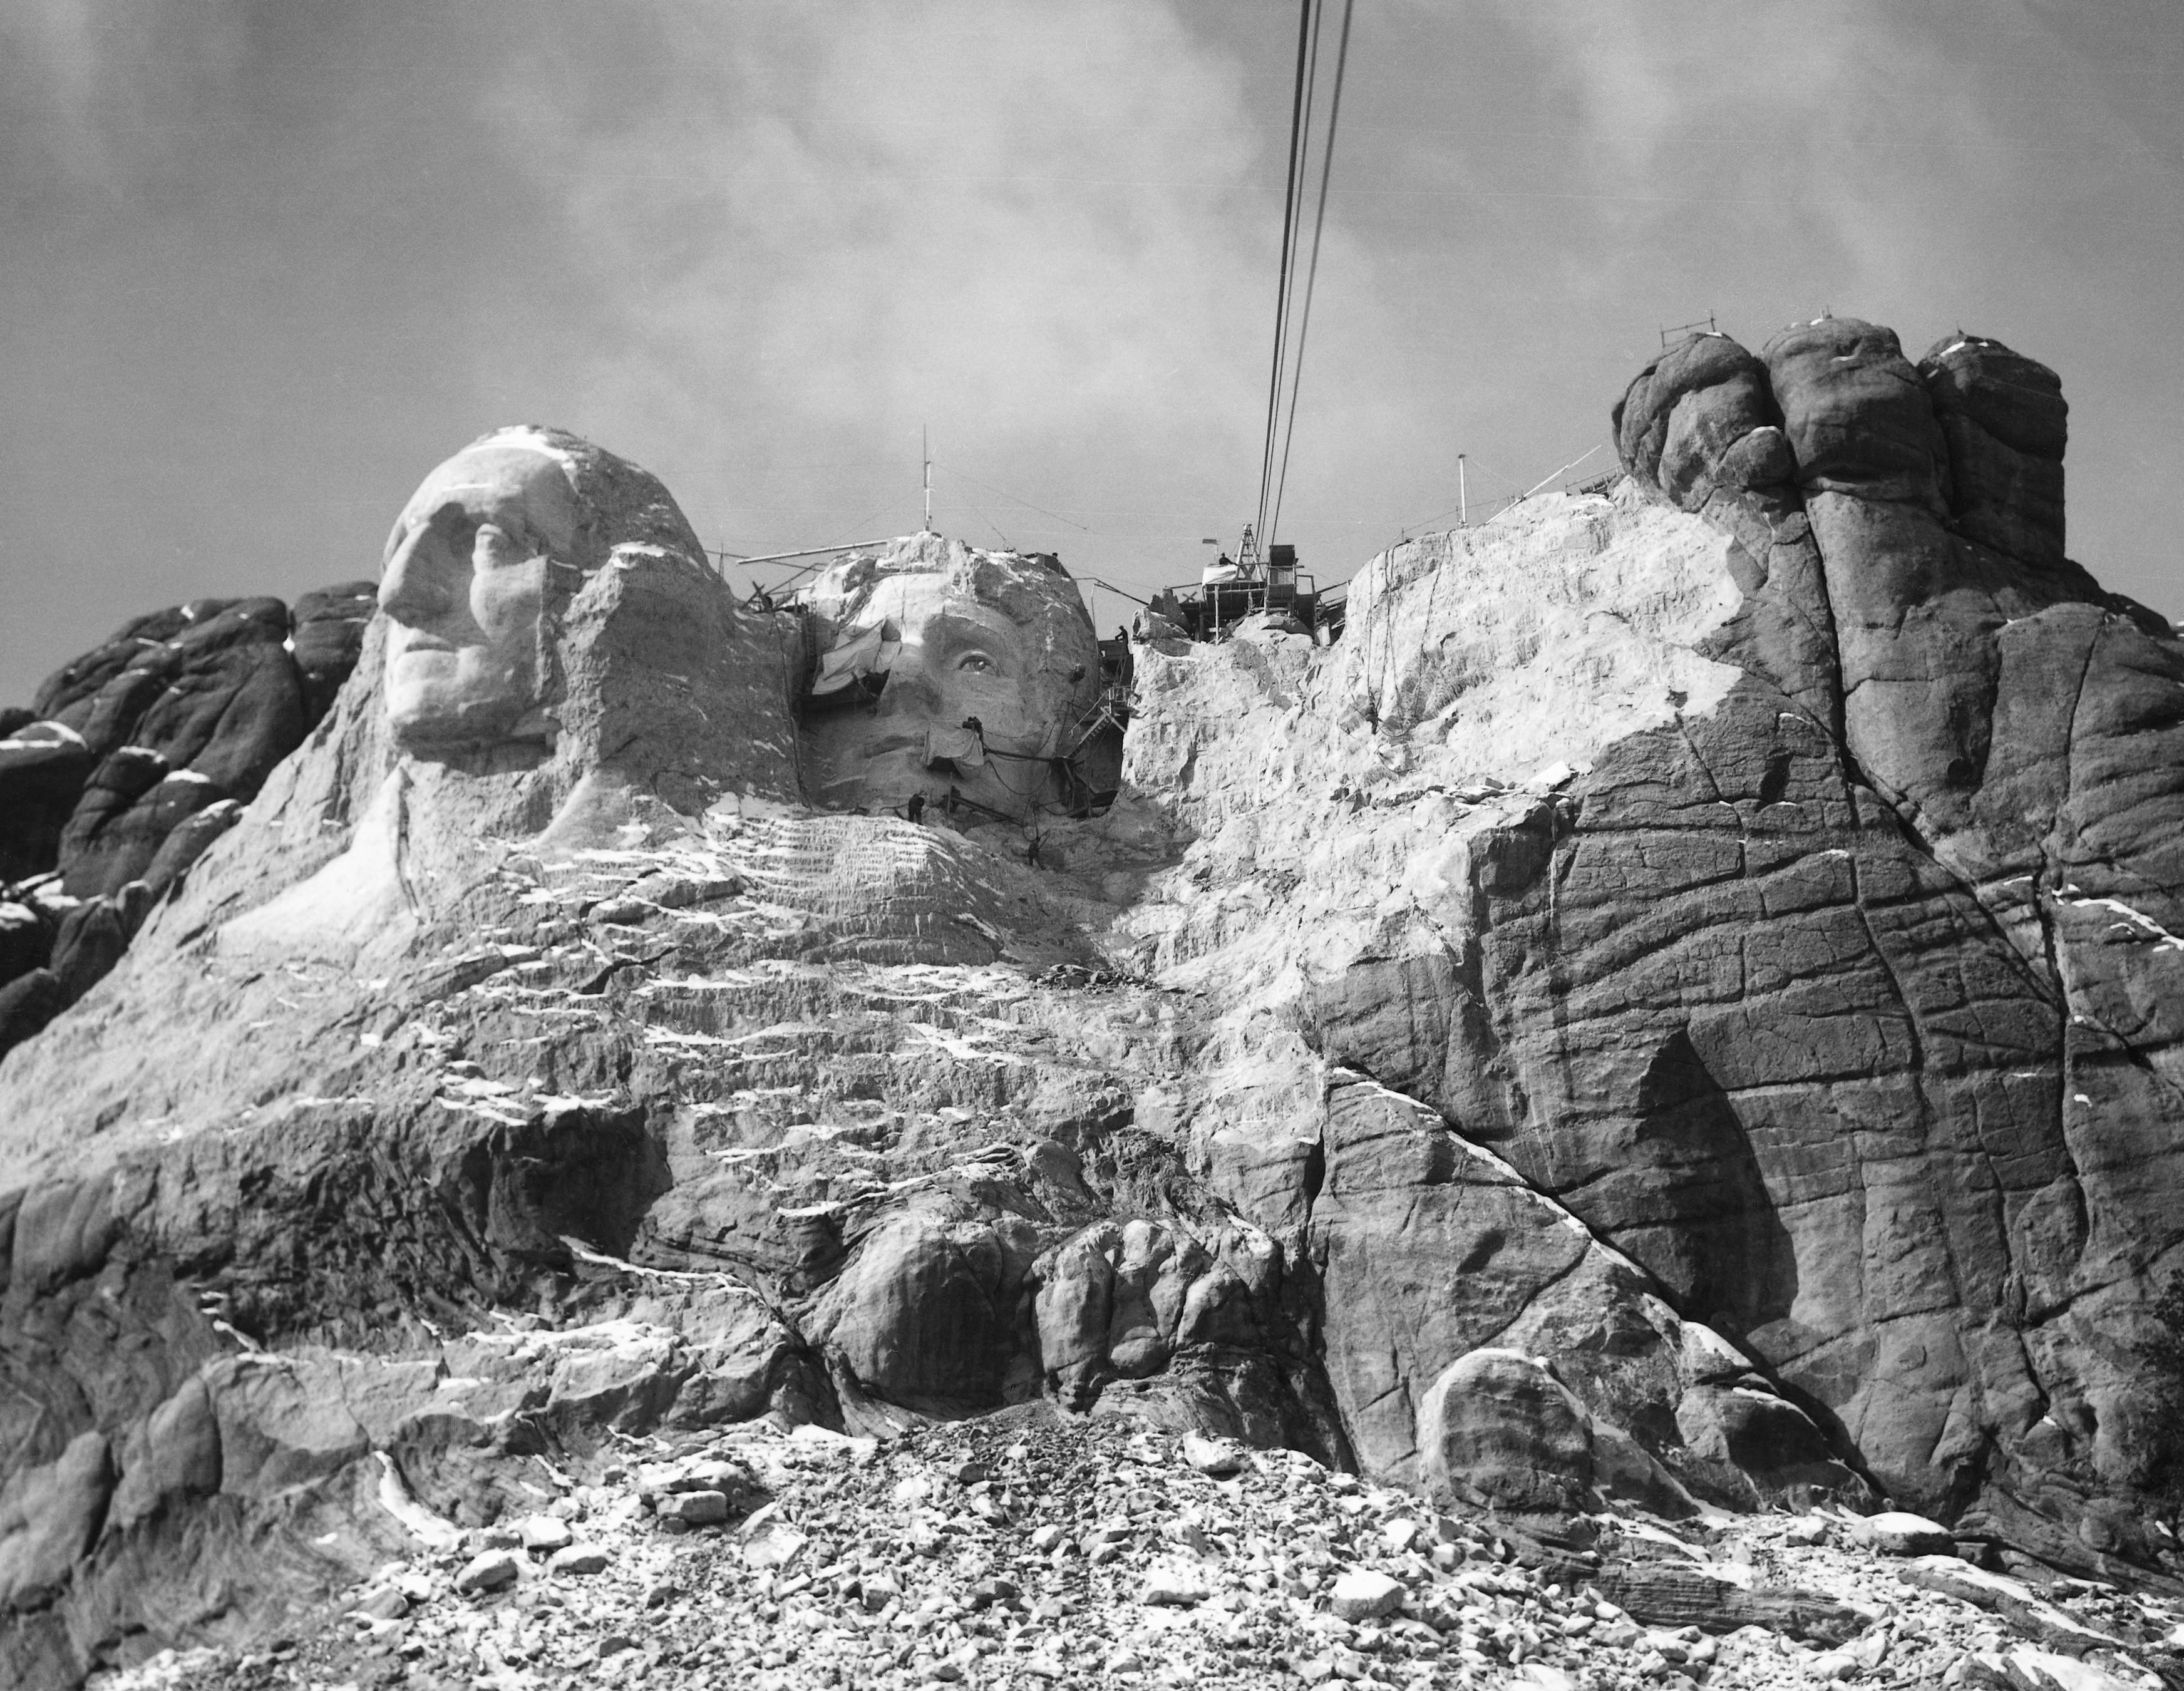 View of Mount Rushmore in progress, 1927-1941.